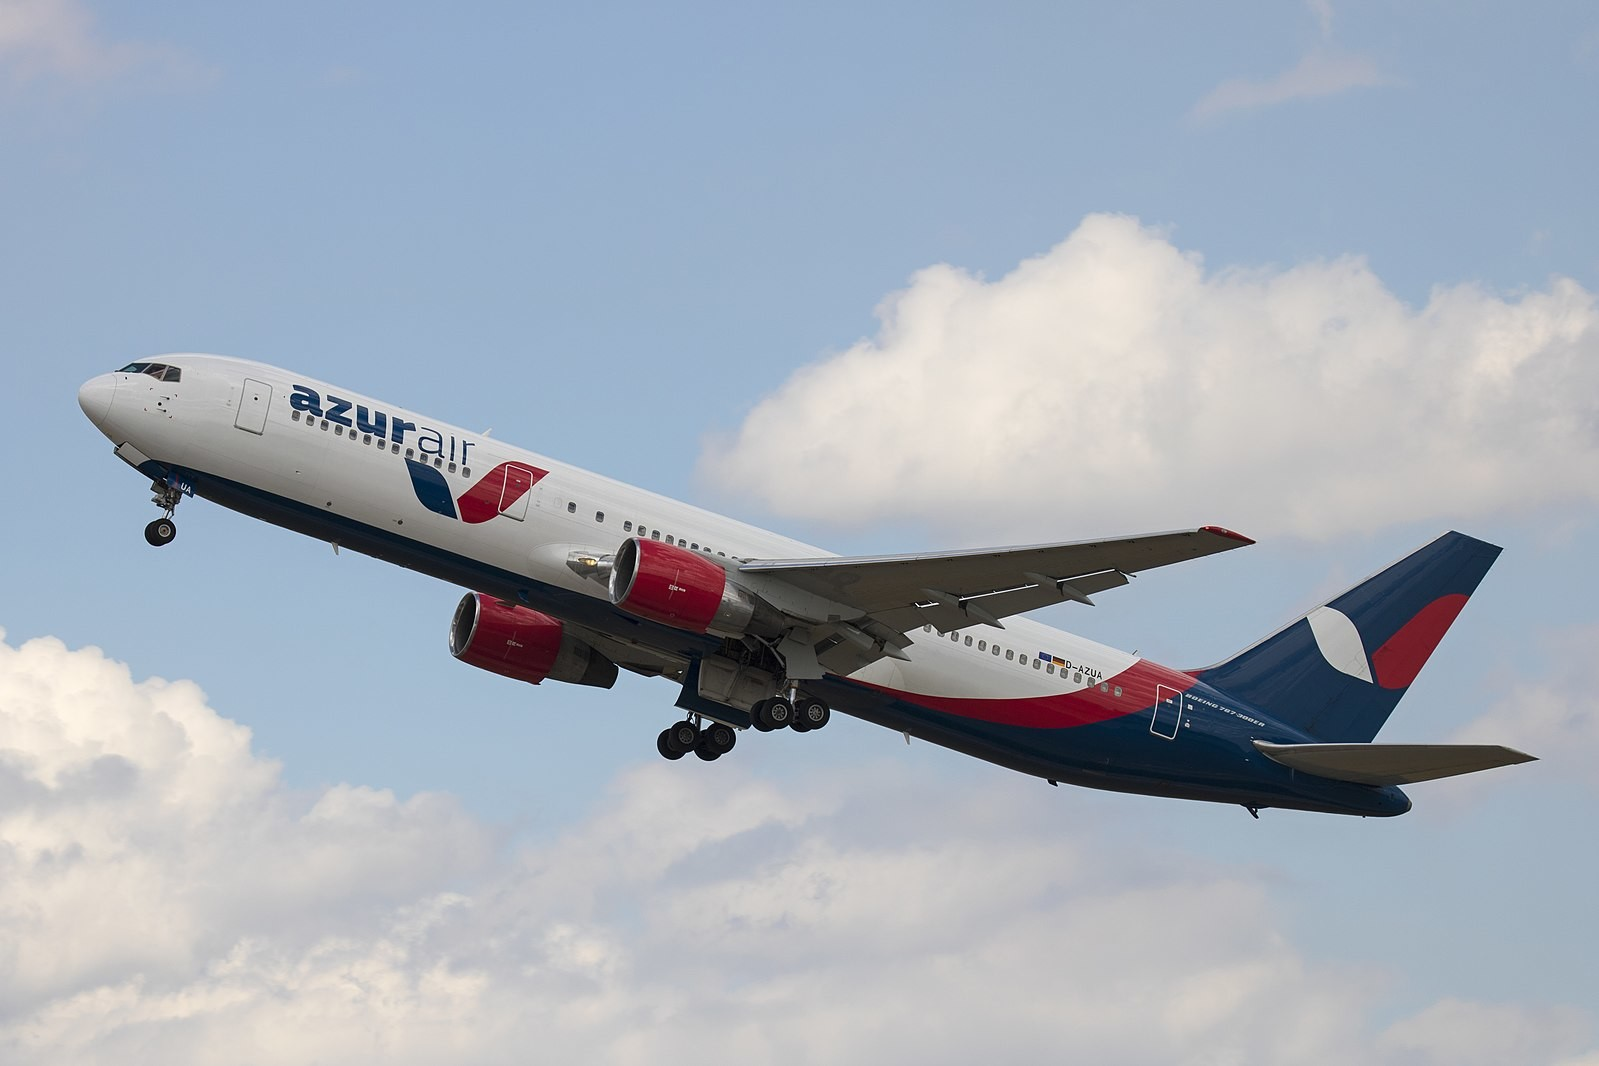 "<p>Фото © <a href=""https://commons.wikimedia.org/wiki/File:D-AZUA_Boeing_767-300ER_Azur_Air_Germany_DUS_2018-07-31_(12)_(42865209575).jpg"" target=""_self"">Wikipedia</a></p>"